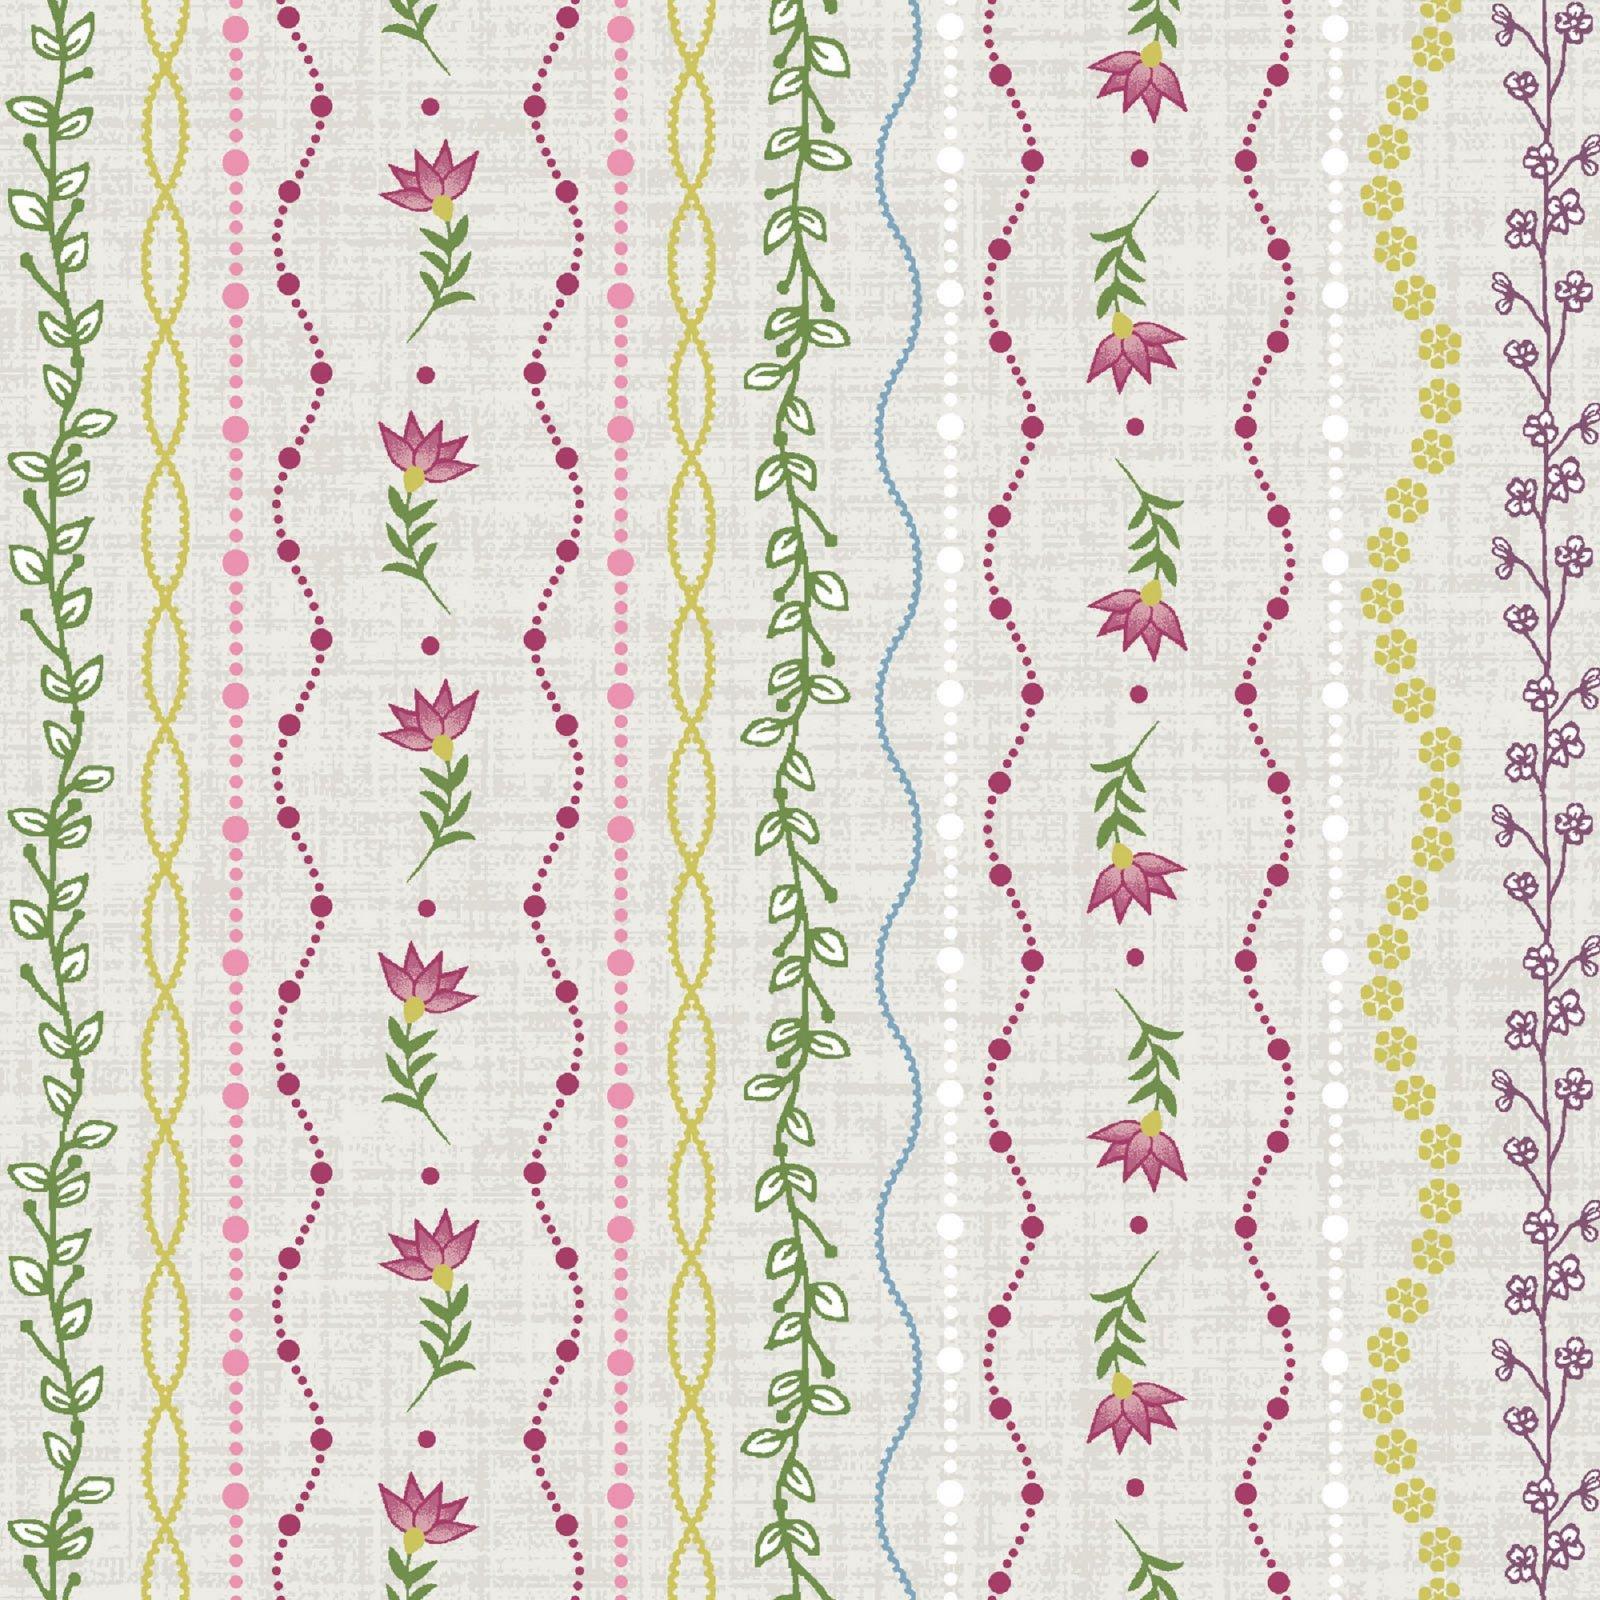 Flower & Vine - Stripe - Ecru